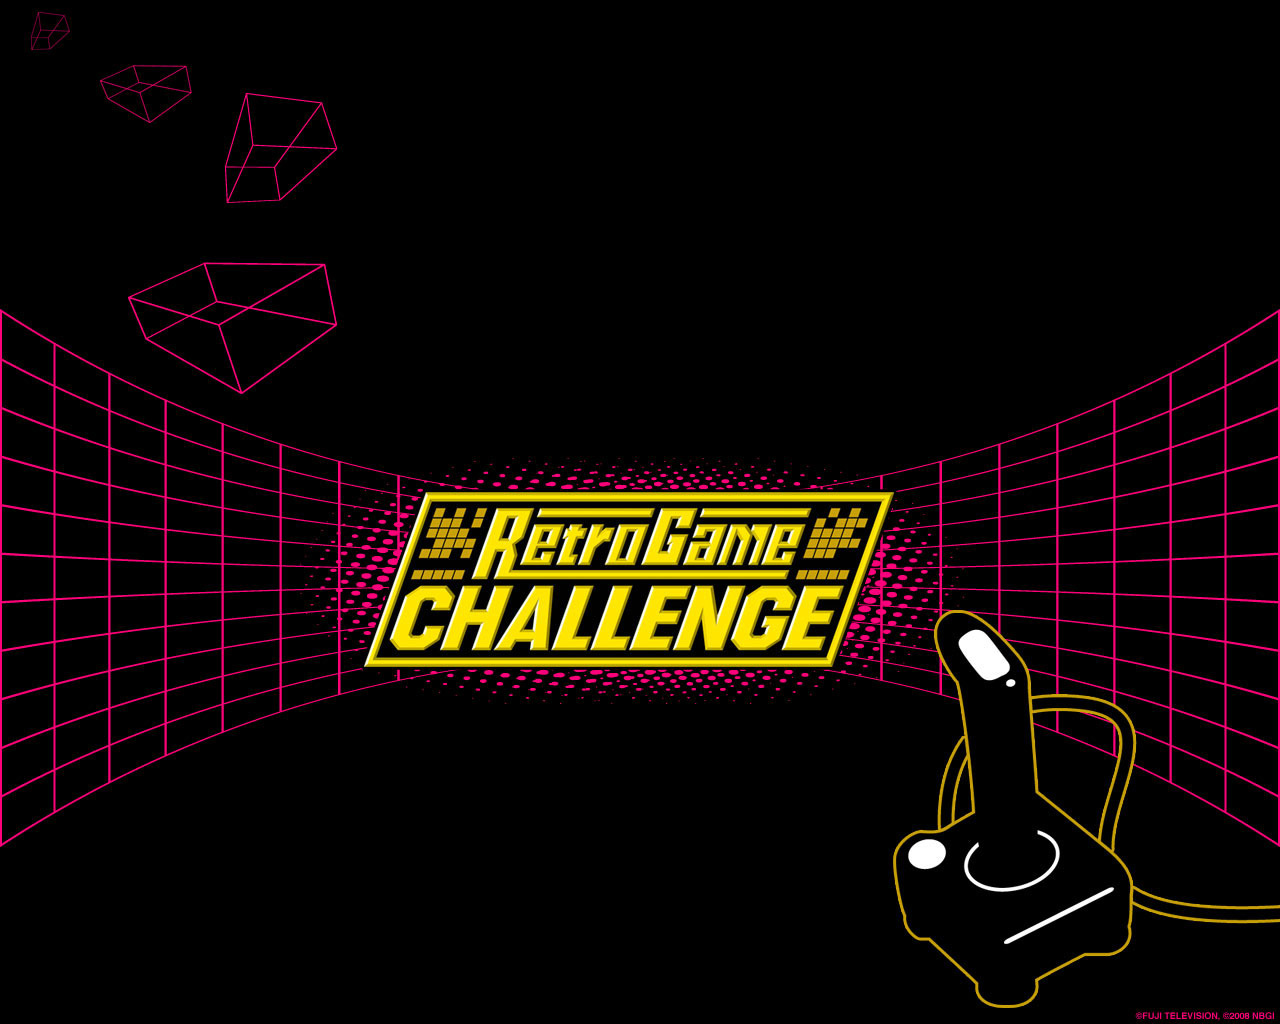 Thread: Joystick - Retro Game Challenge Wallpaper : Joystick Wallpaper